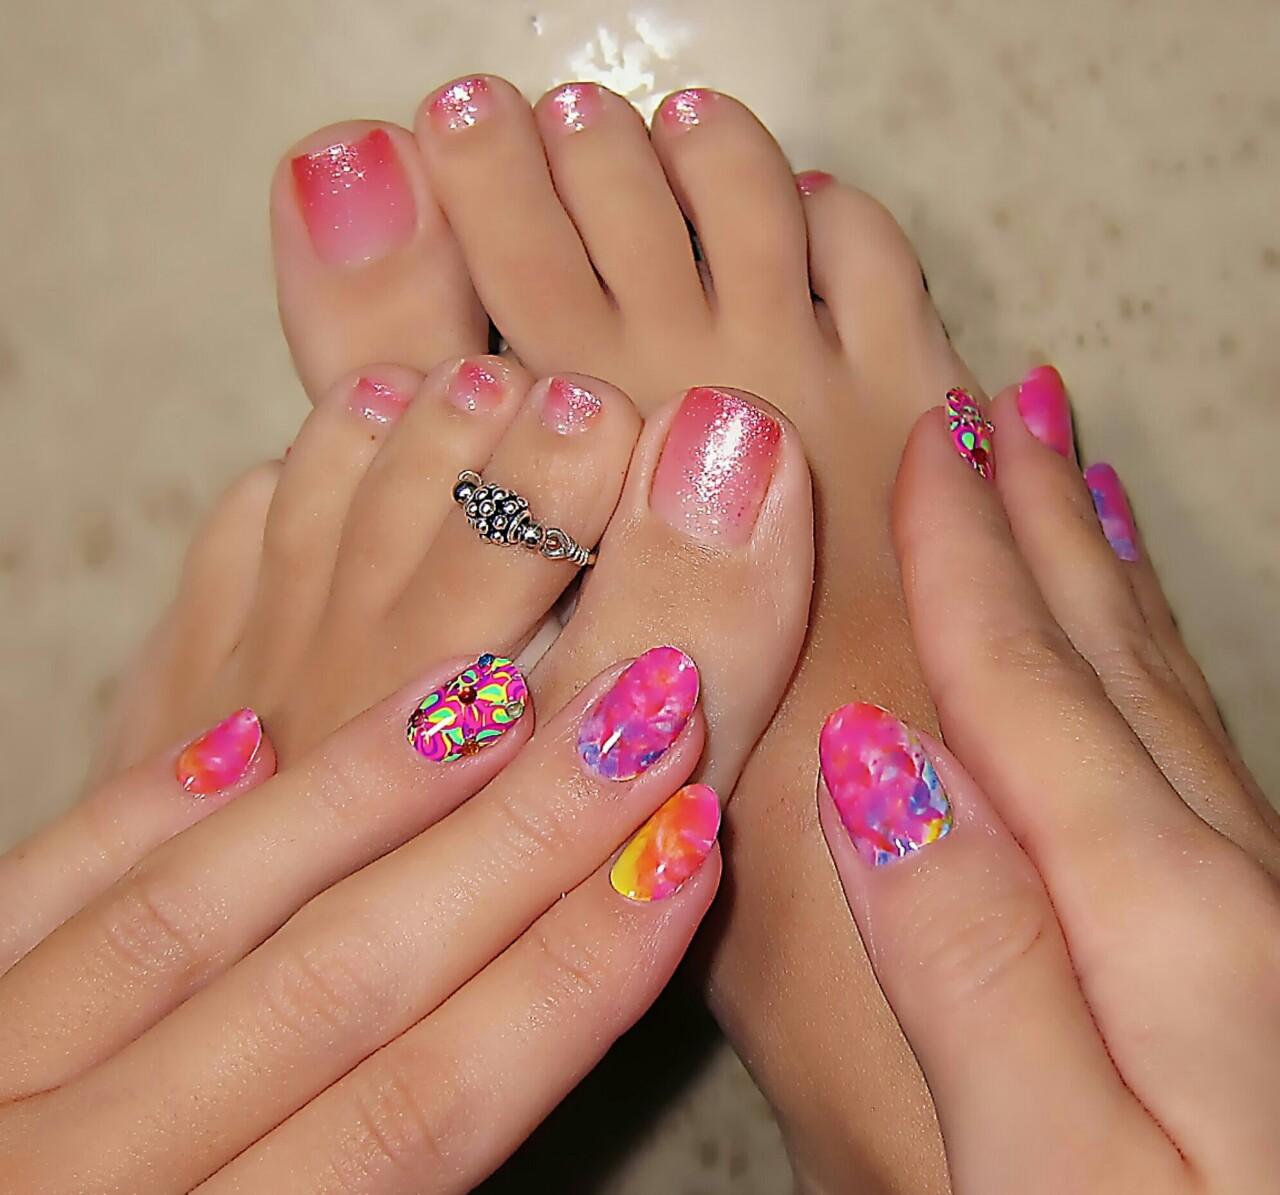 massage erotique prague filles sexy foot